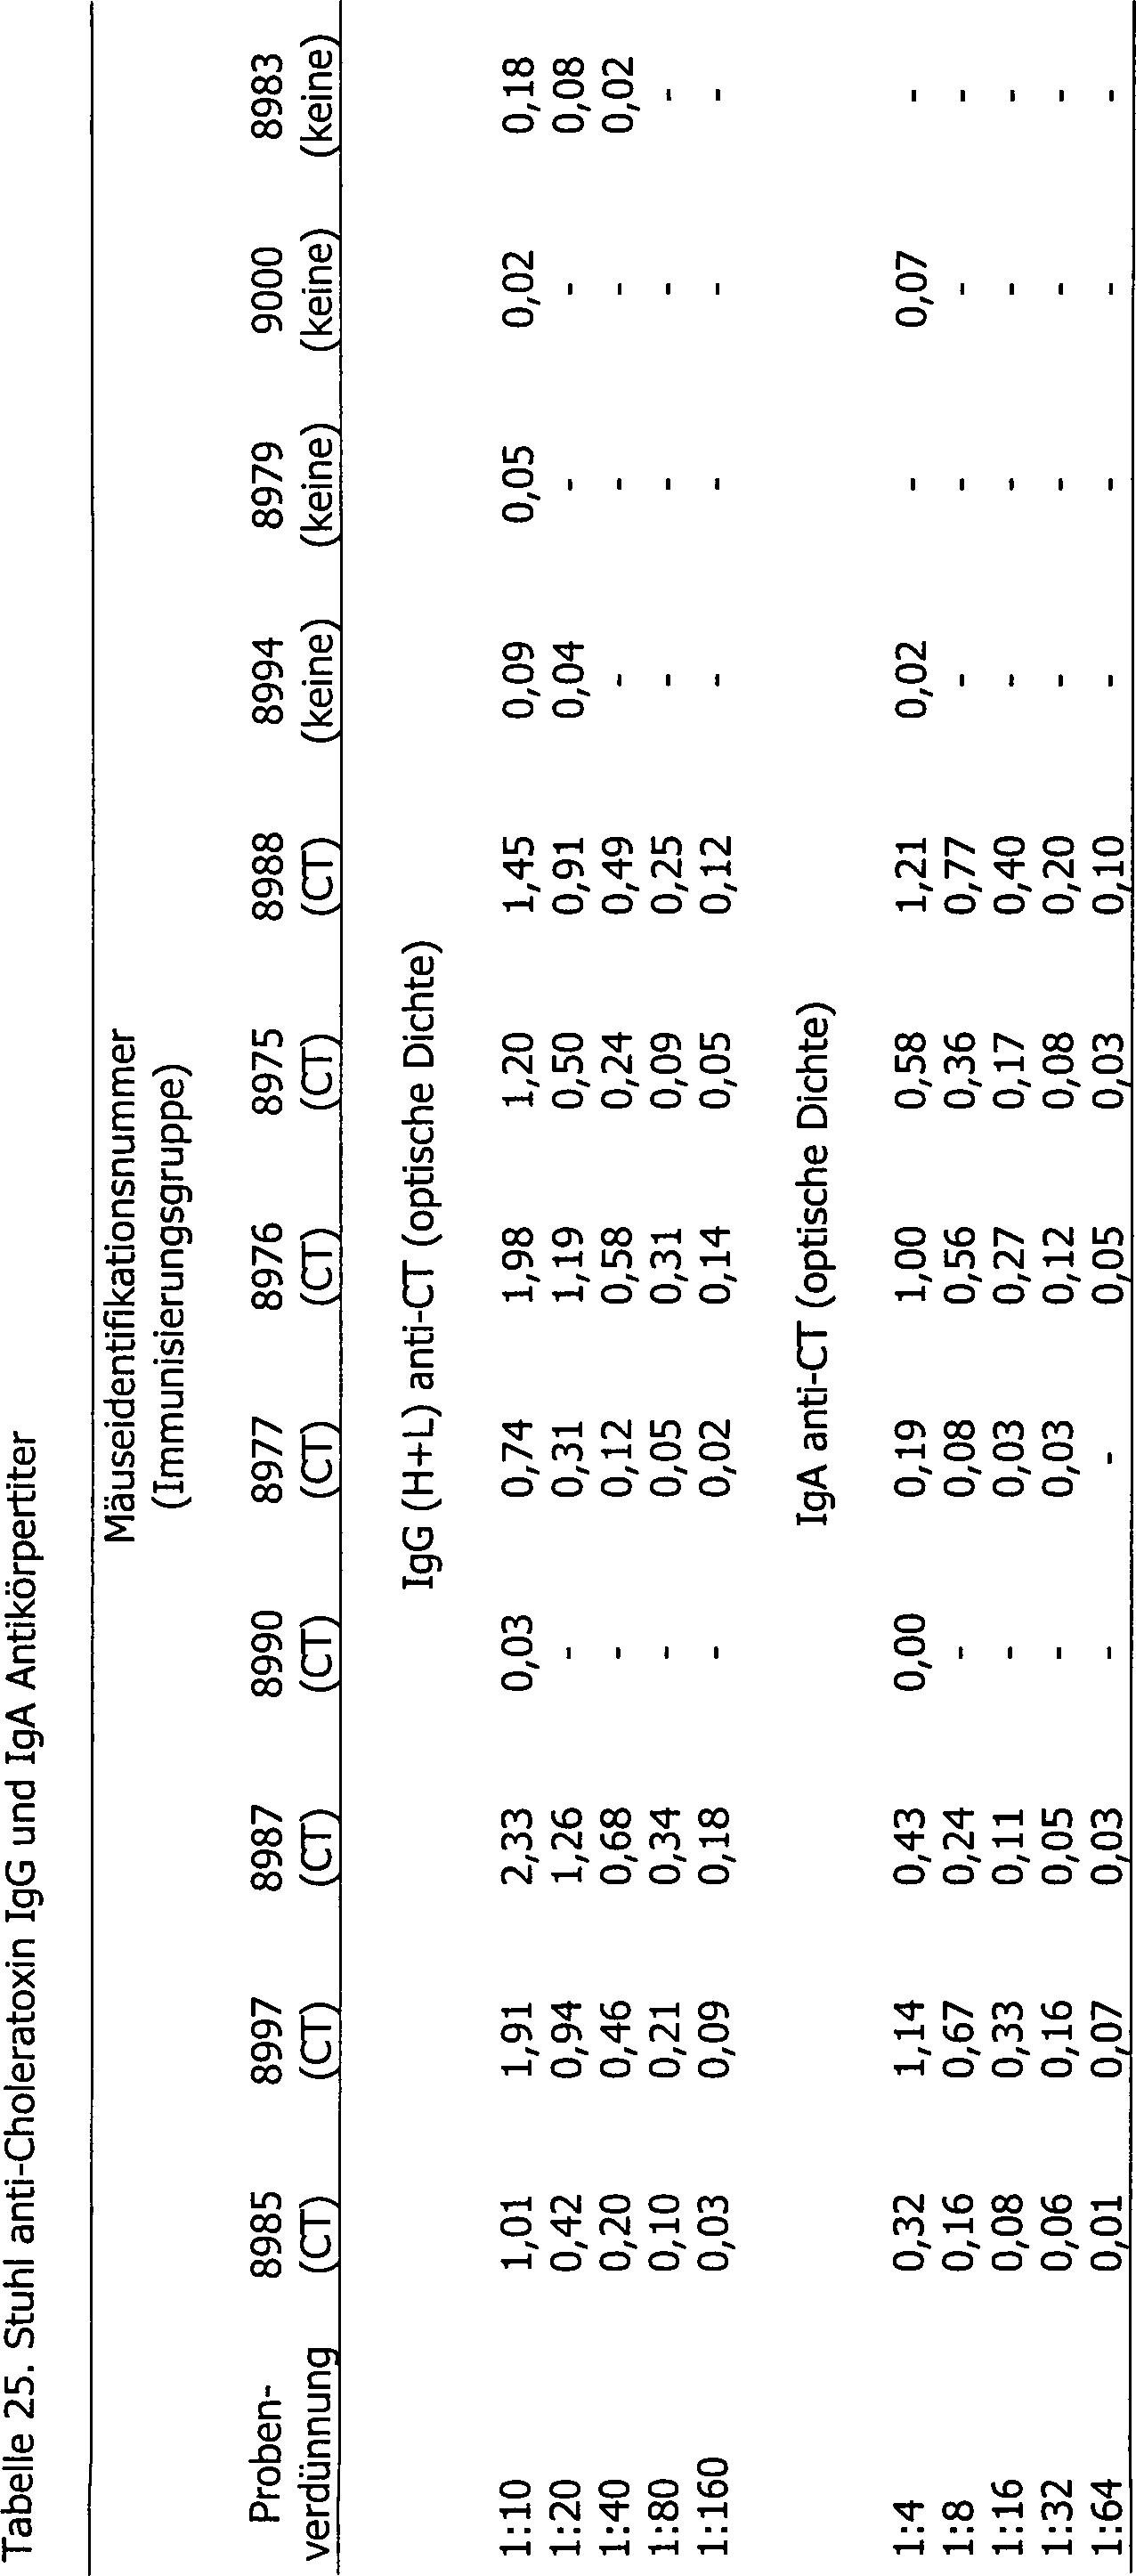 DE69730534T2 - Additive for transcutaneous immunization